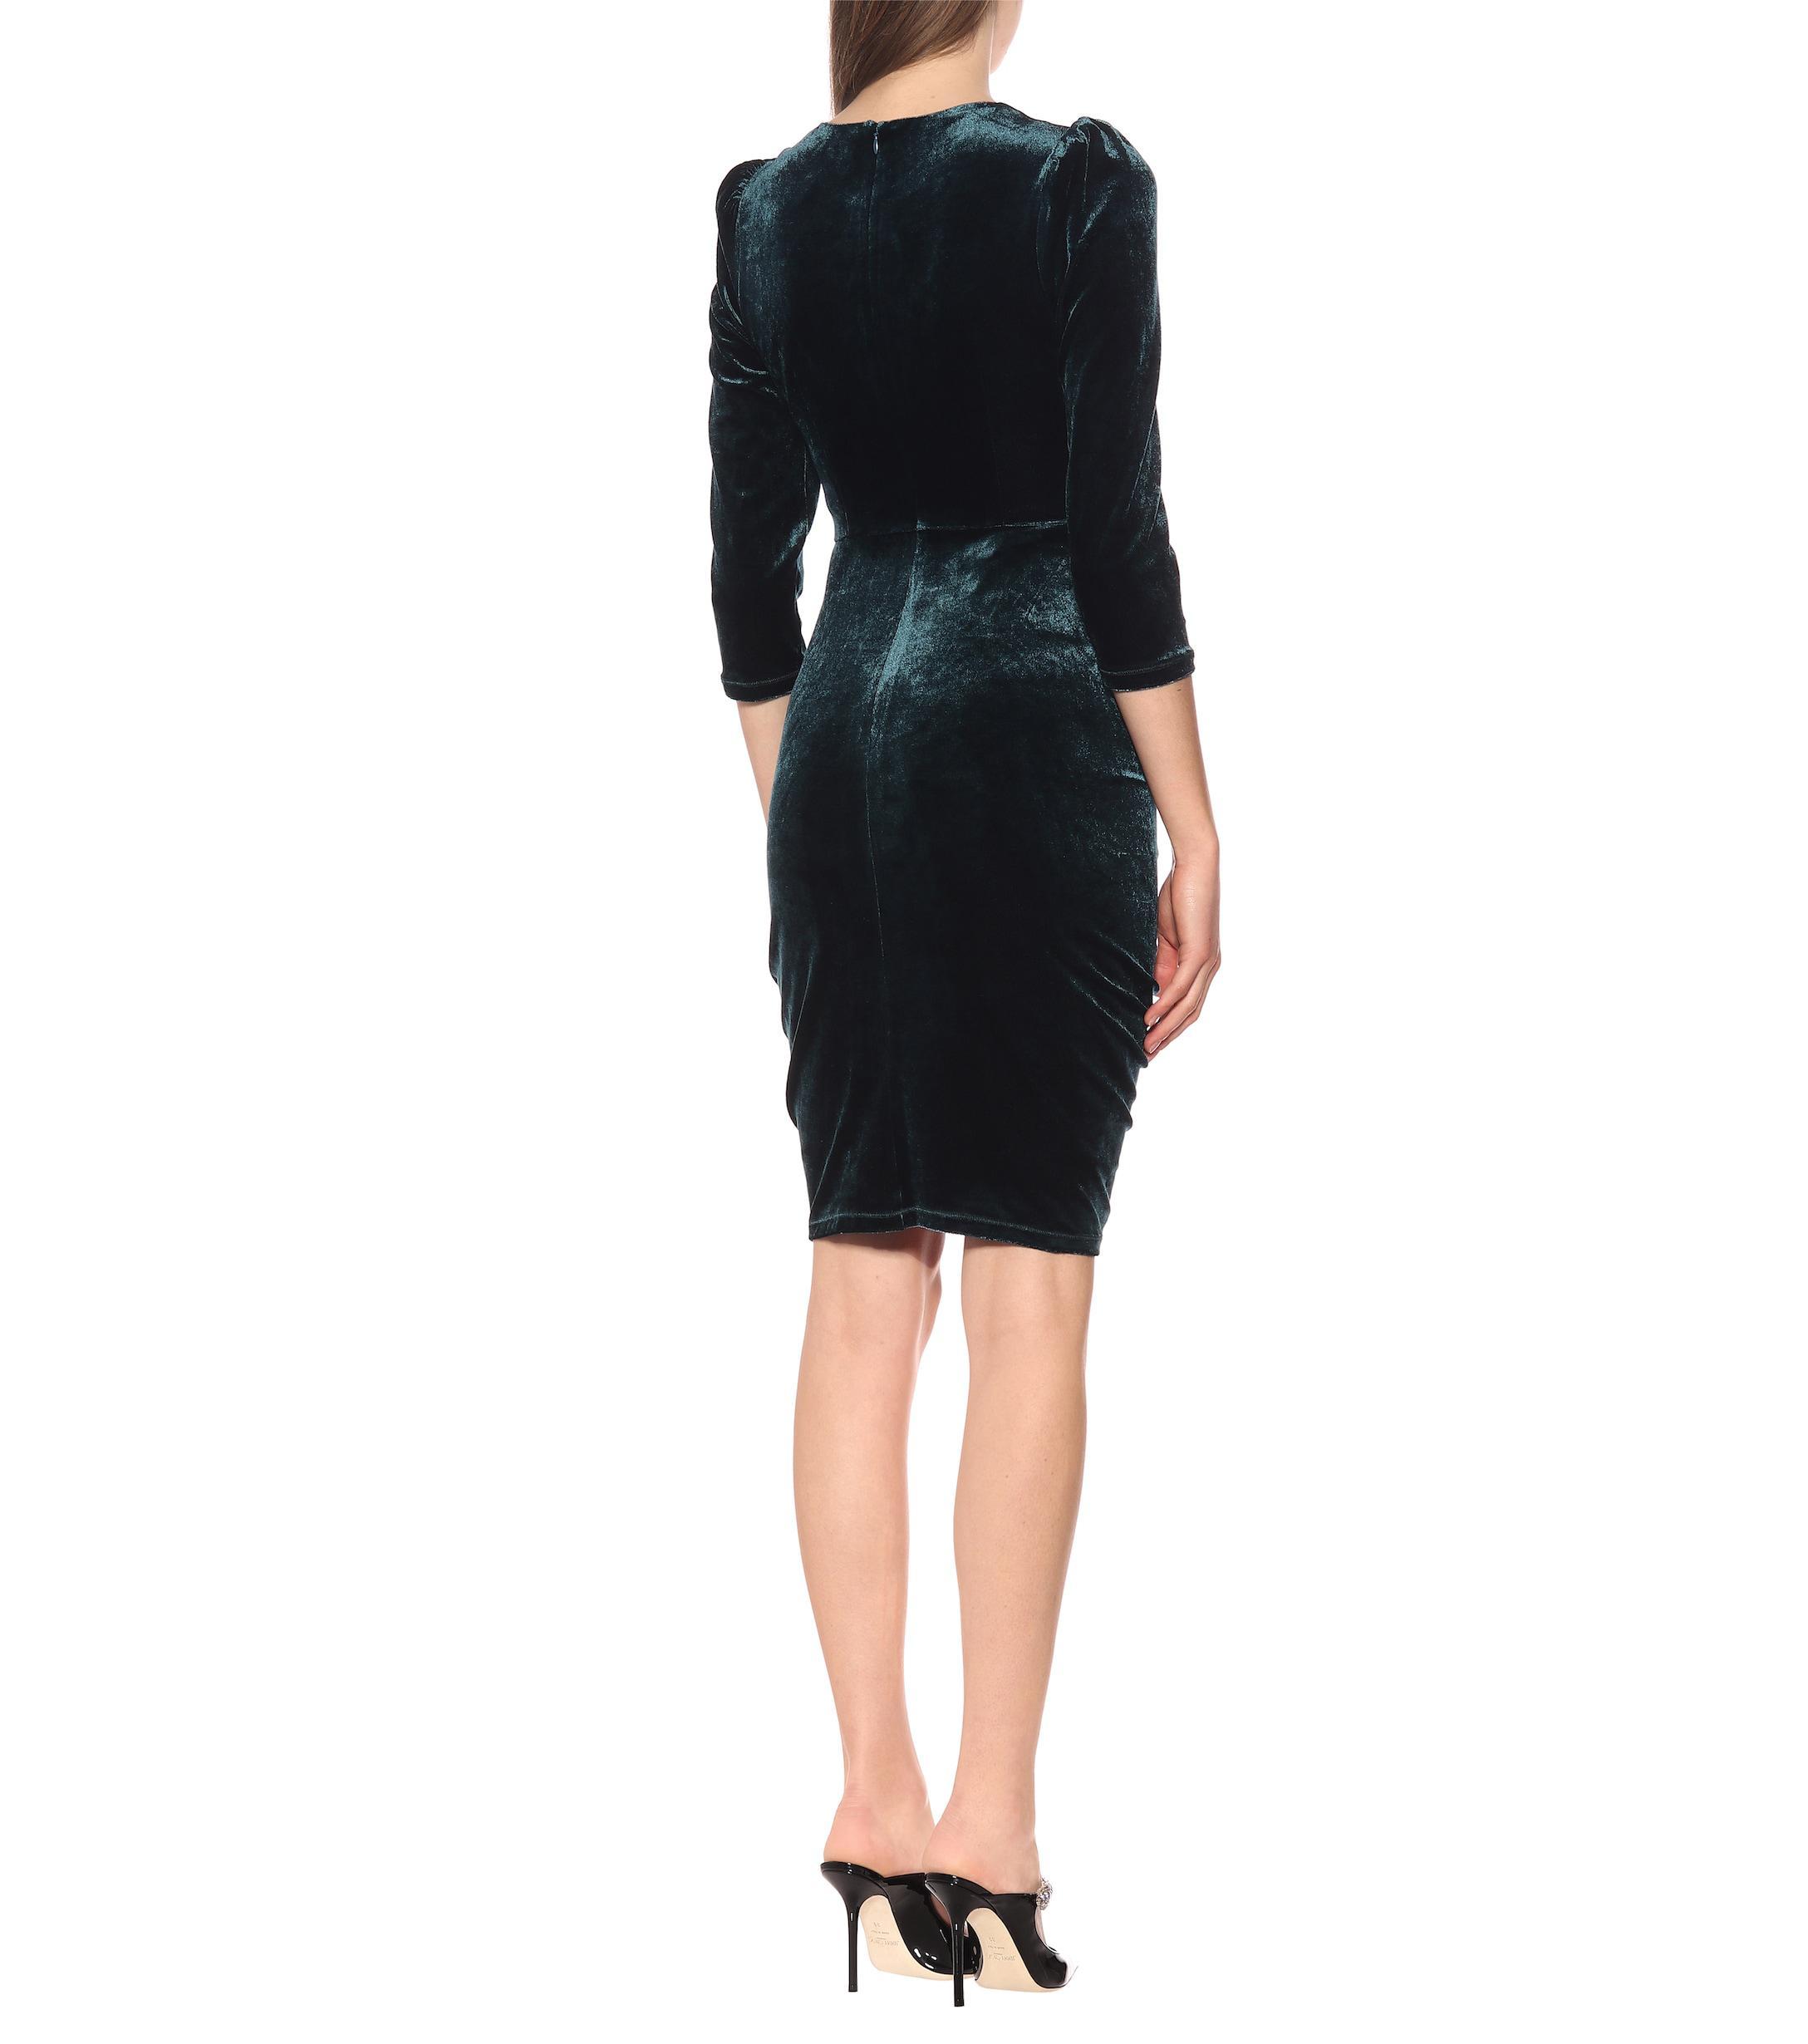 Von Coloris Bruna Diane Velours En Furstenberg Black Robe gvIf76yYb